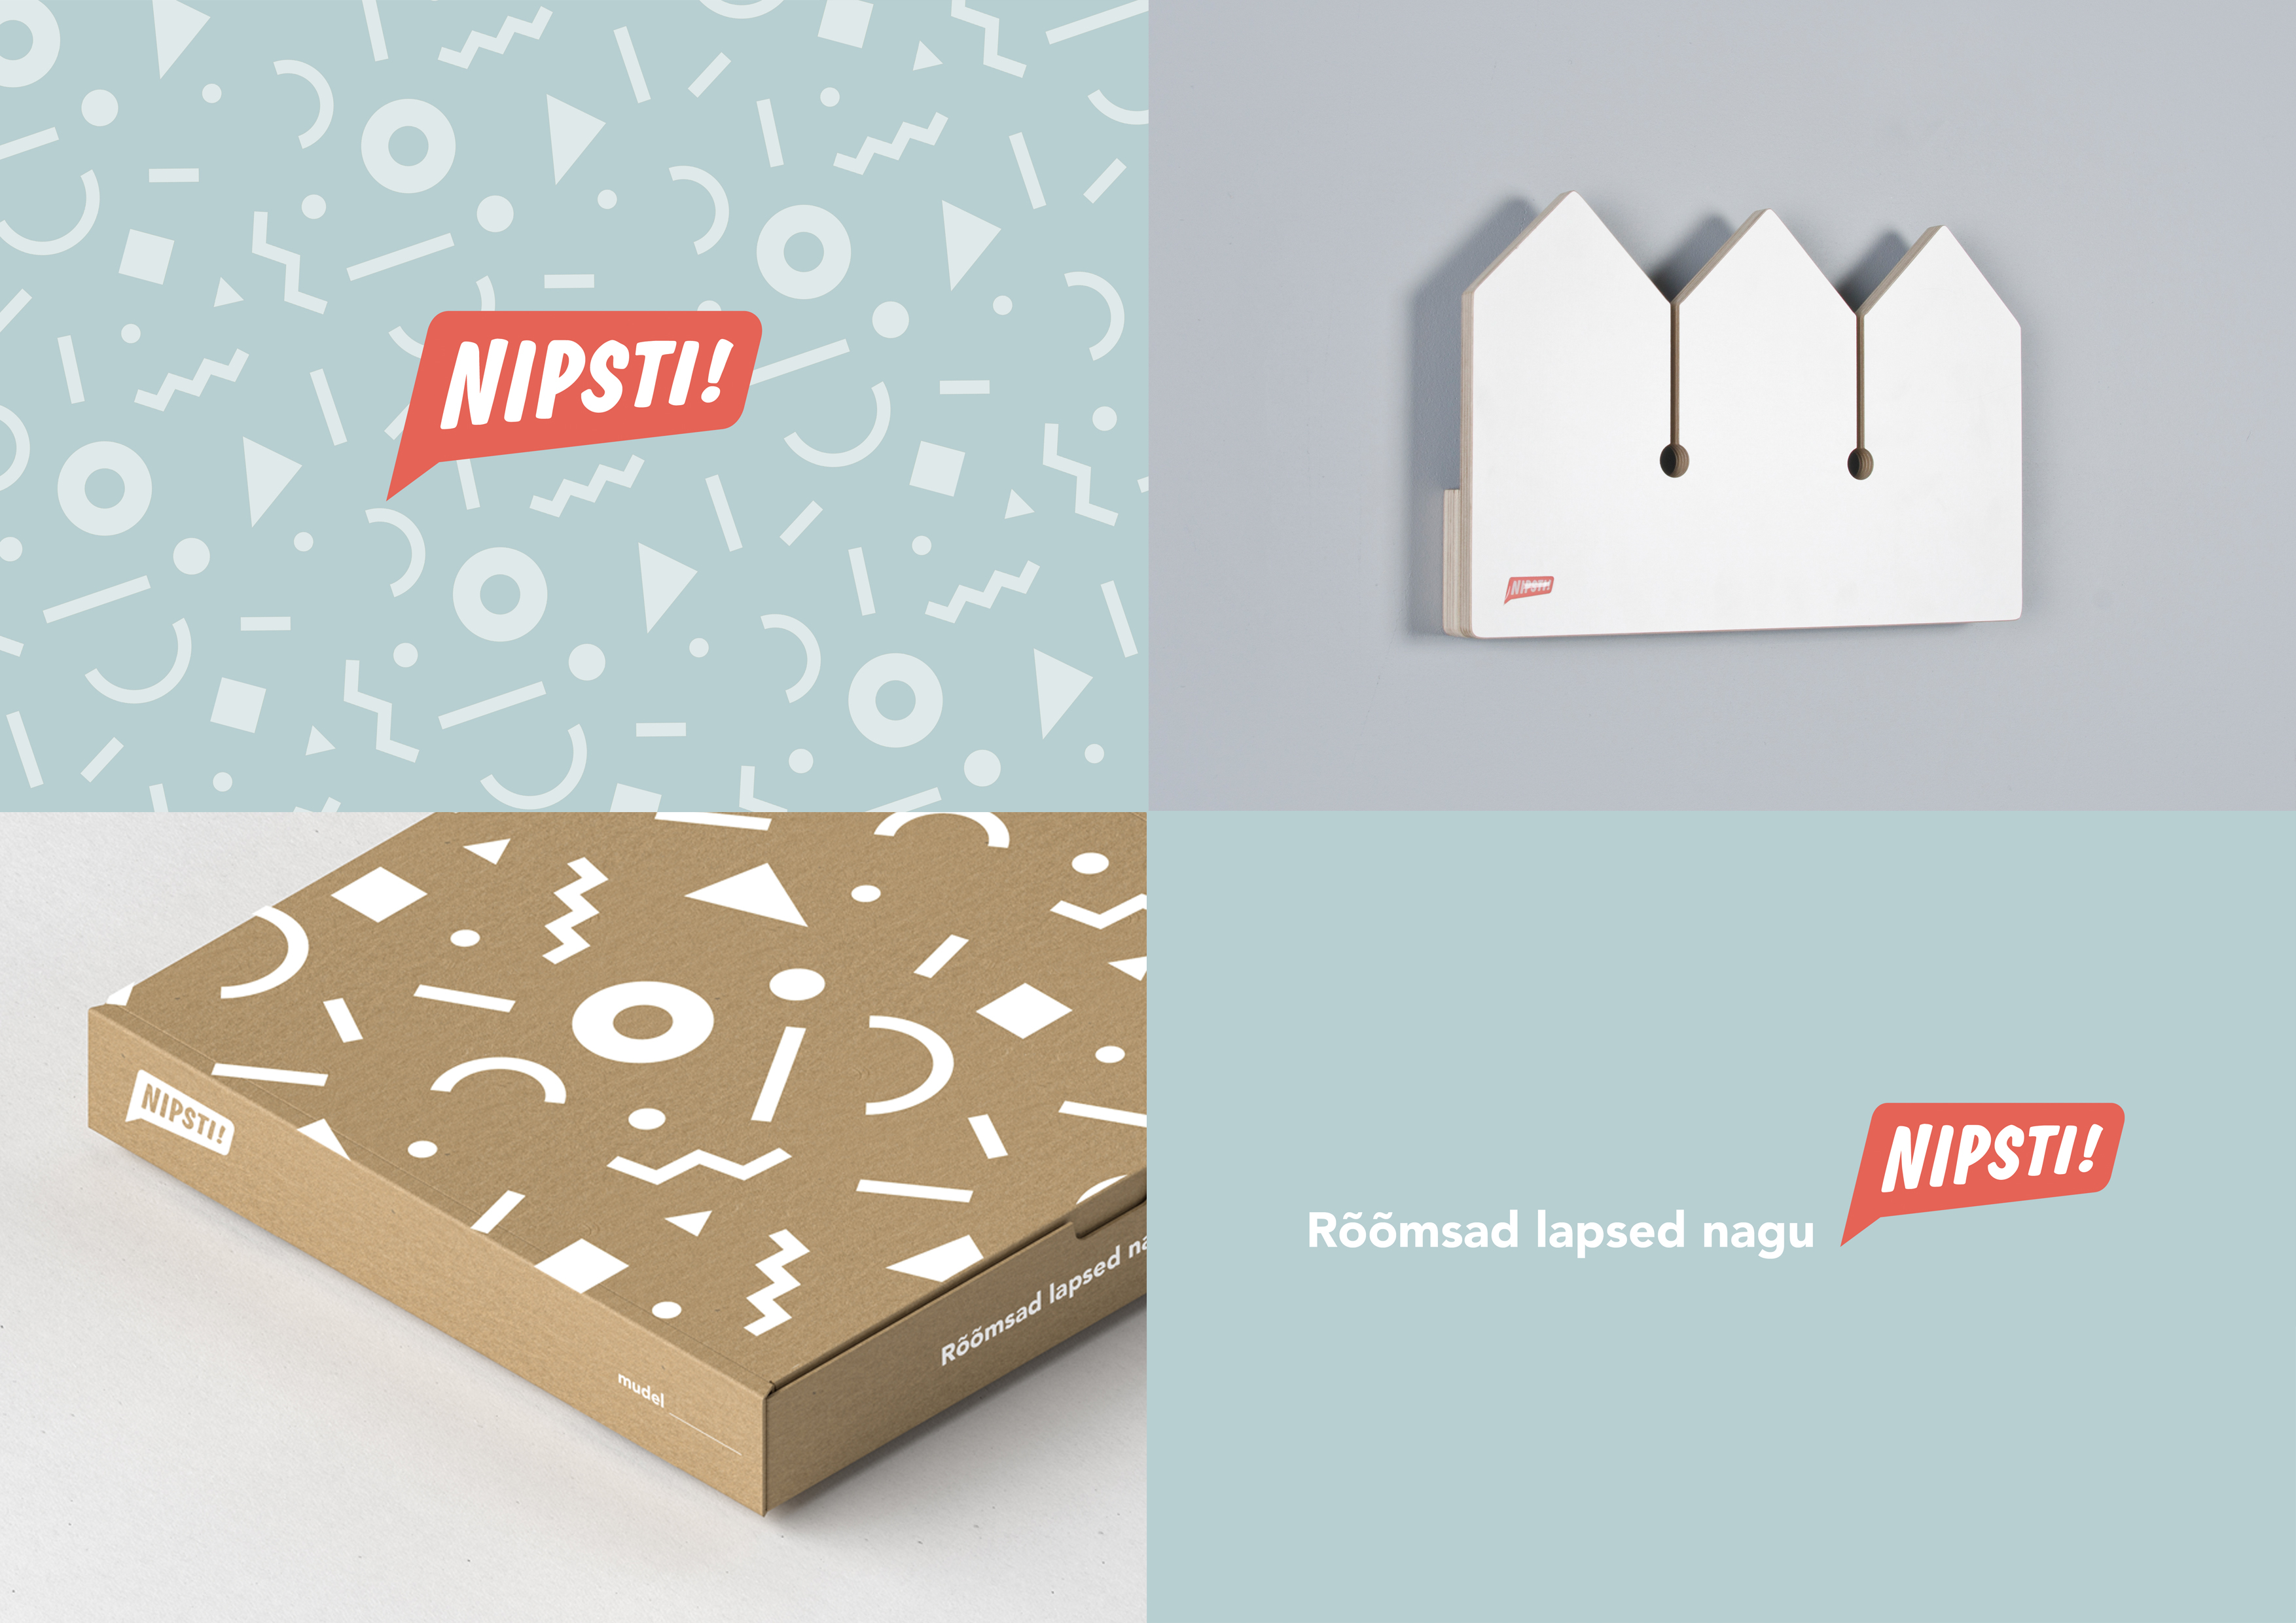 nipsti logo brand